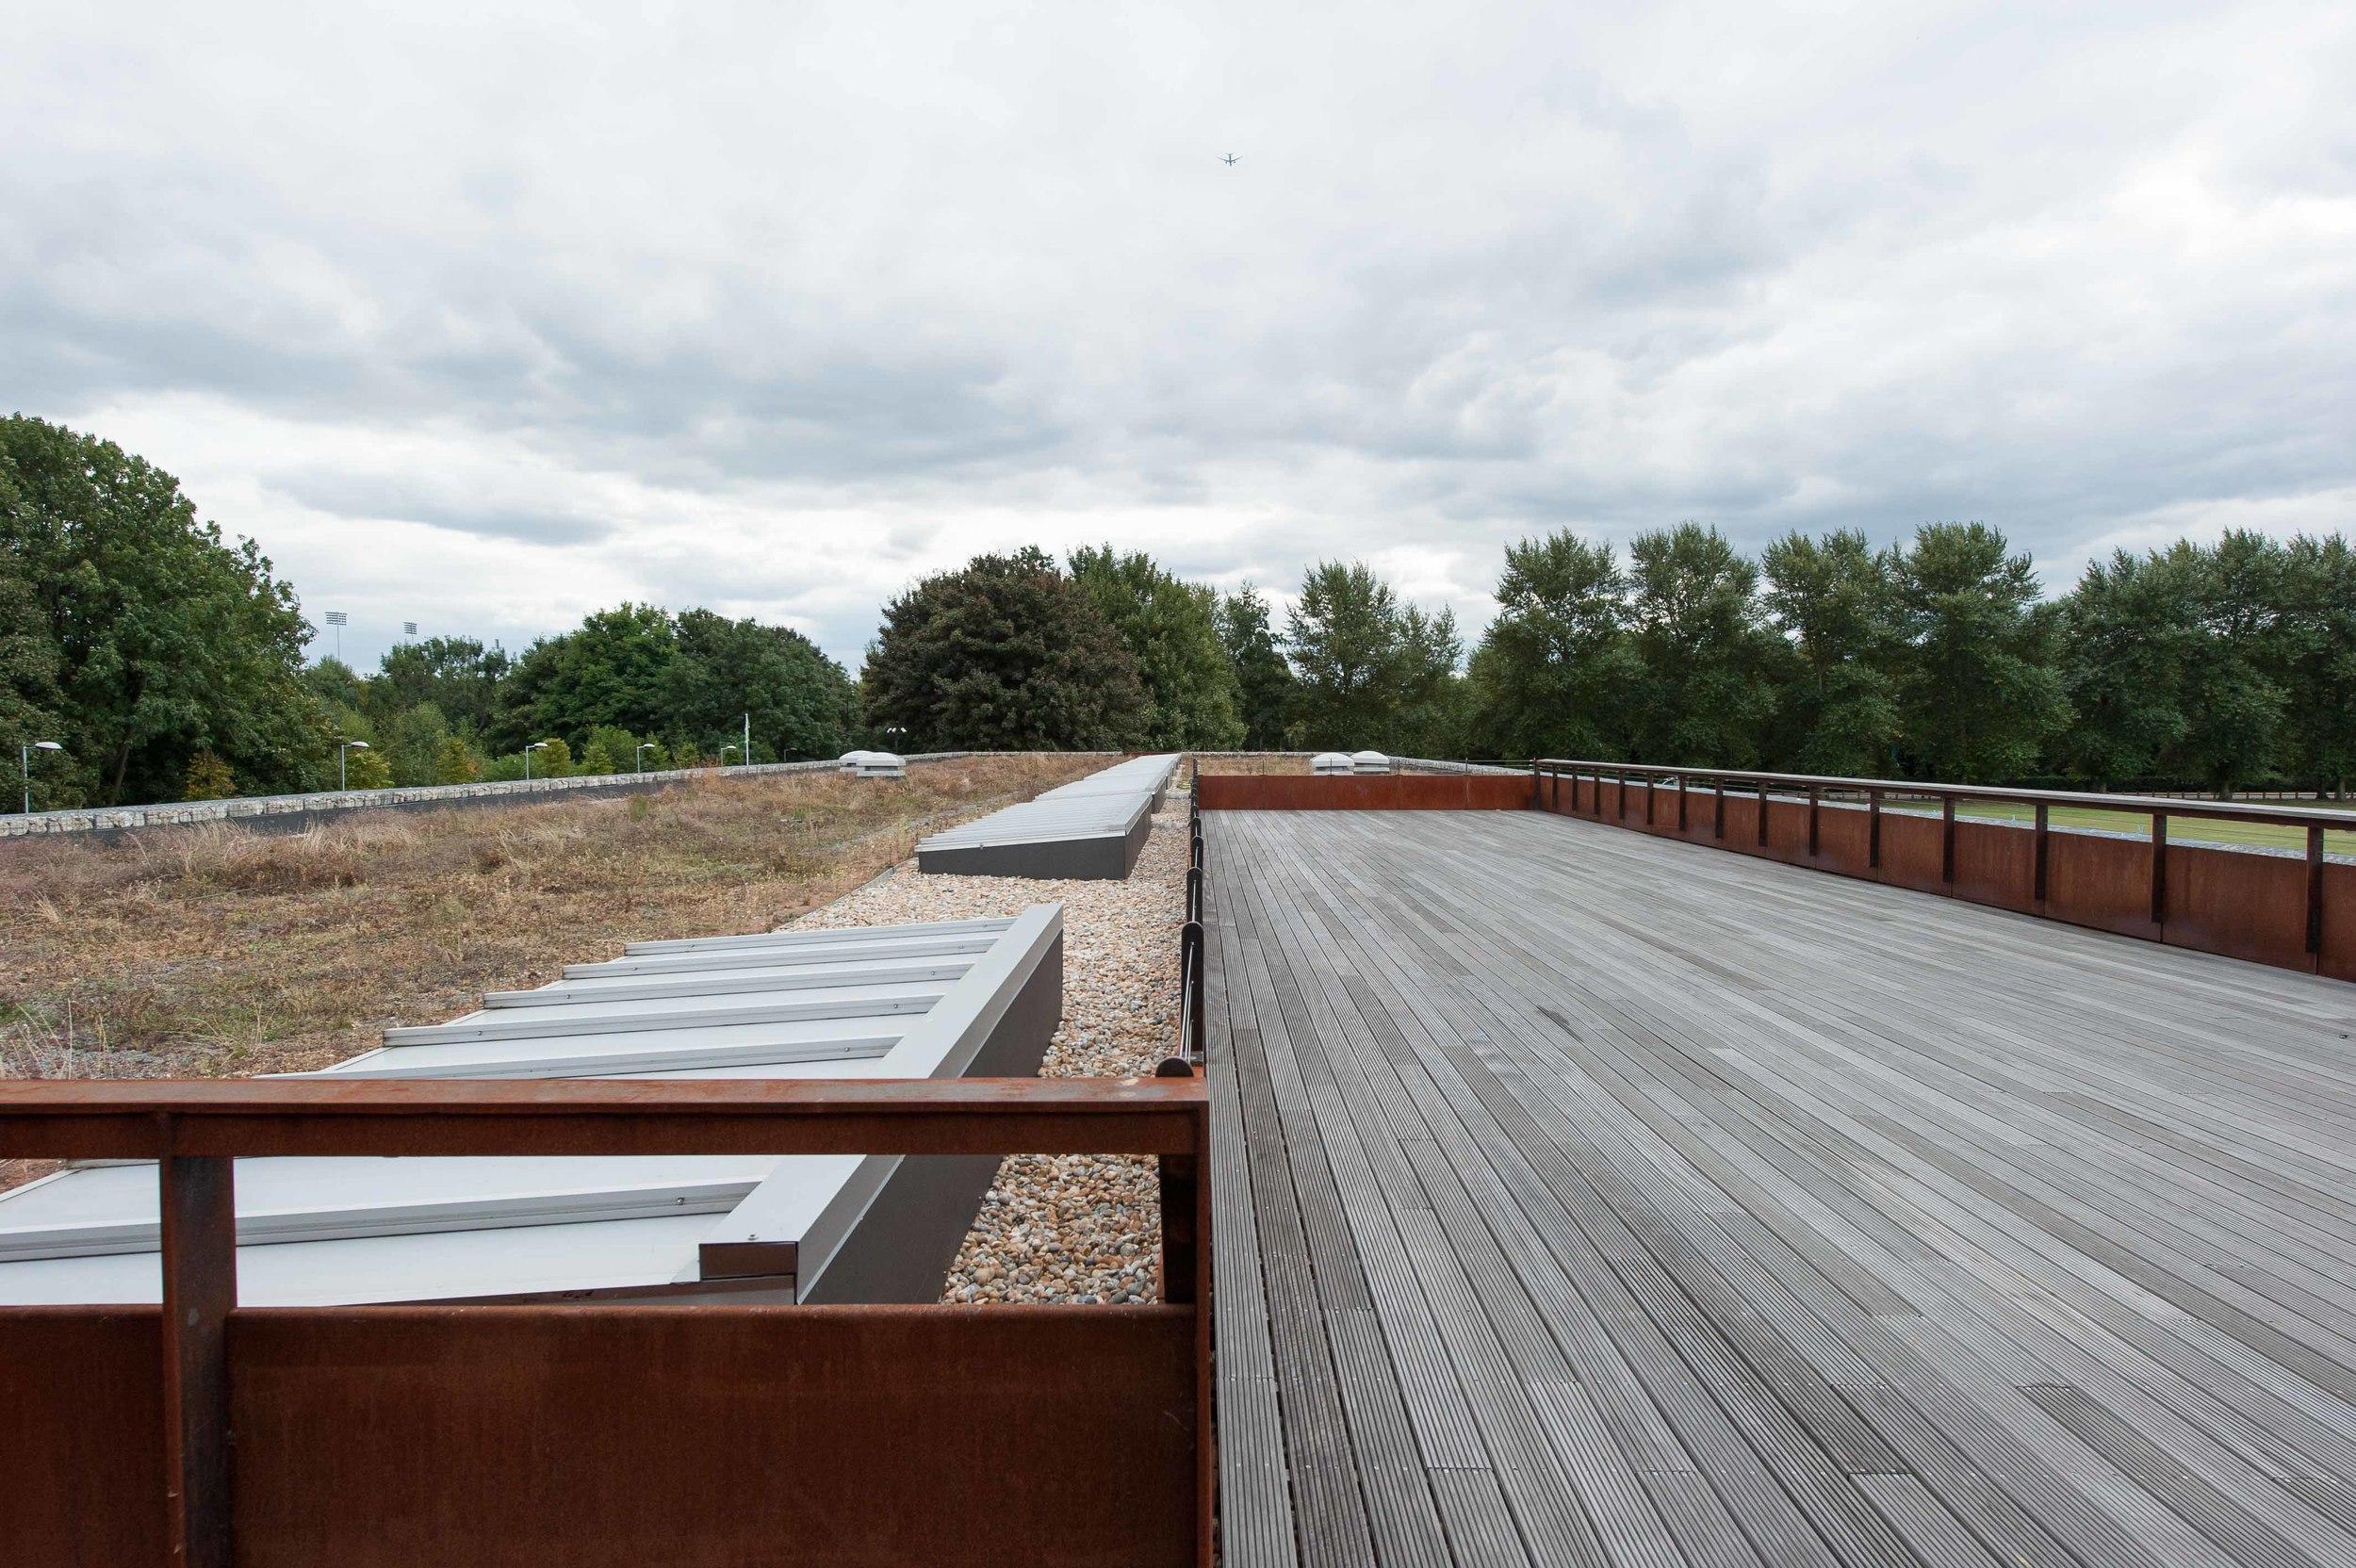 Hackney Marshes Centre Terrace